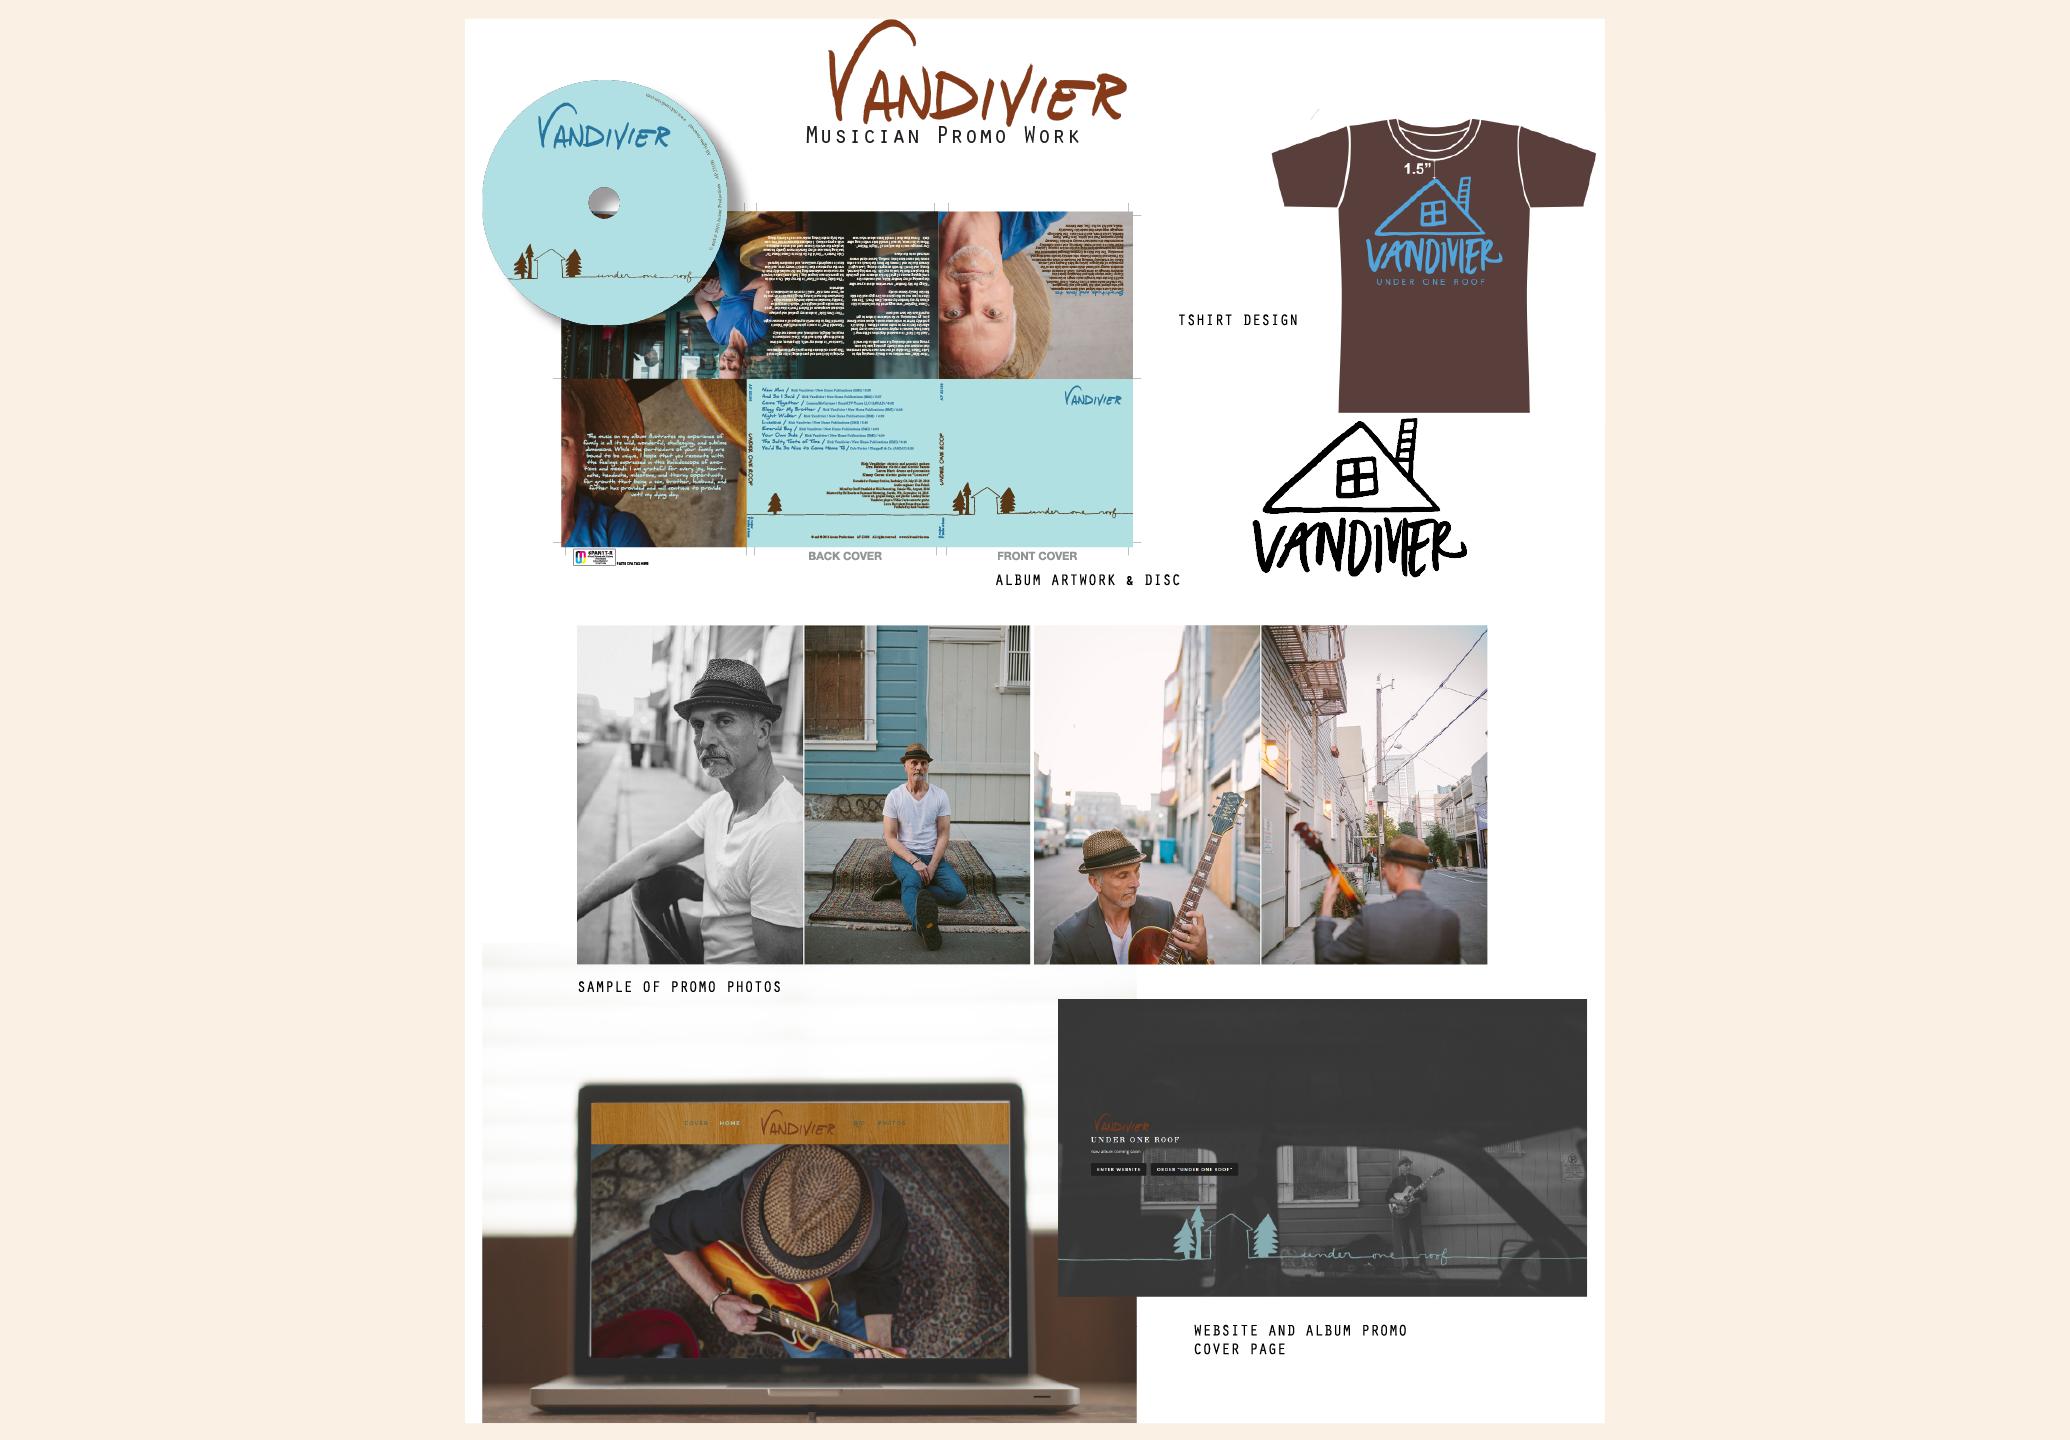 Rick Vandivier - Musician - promo kit